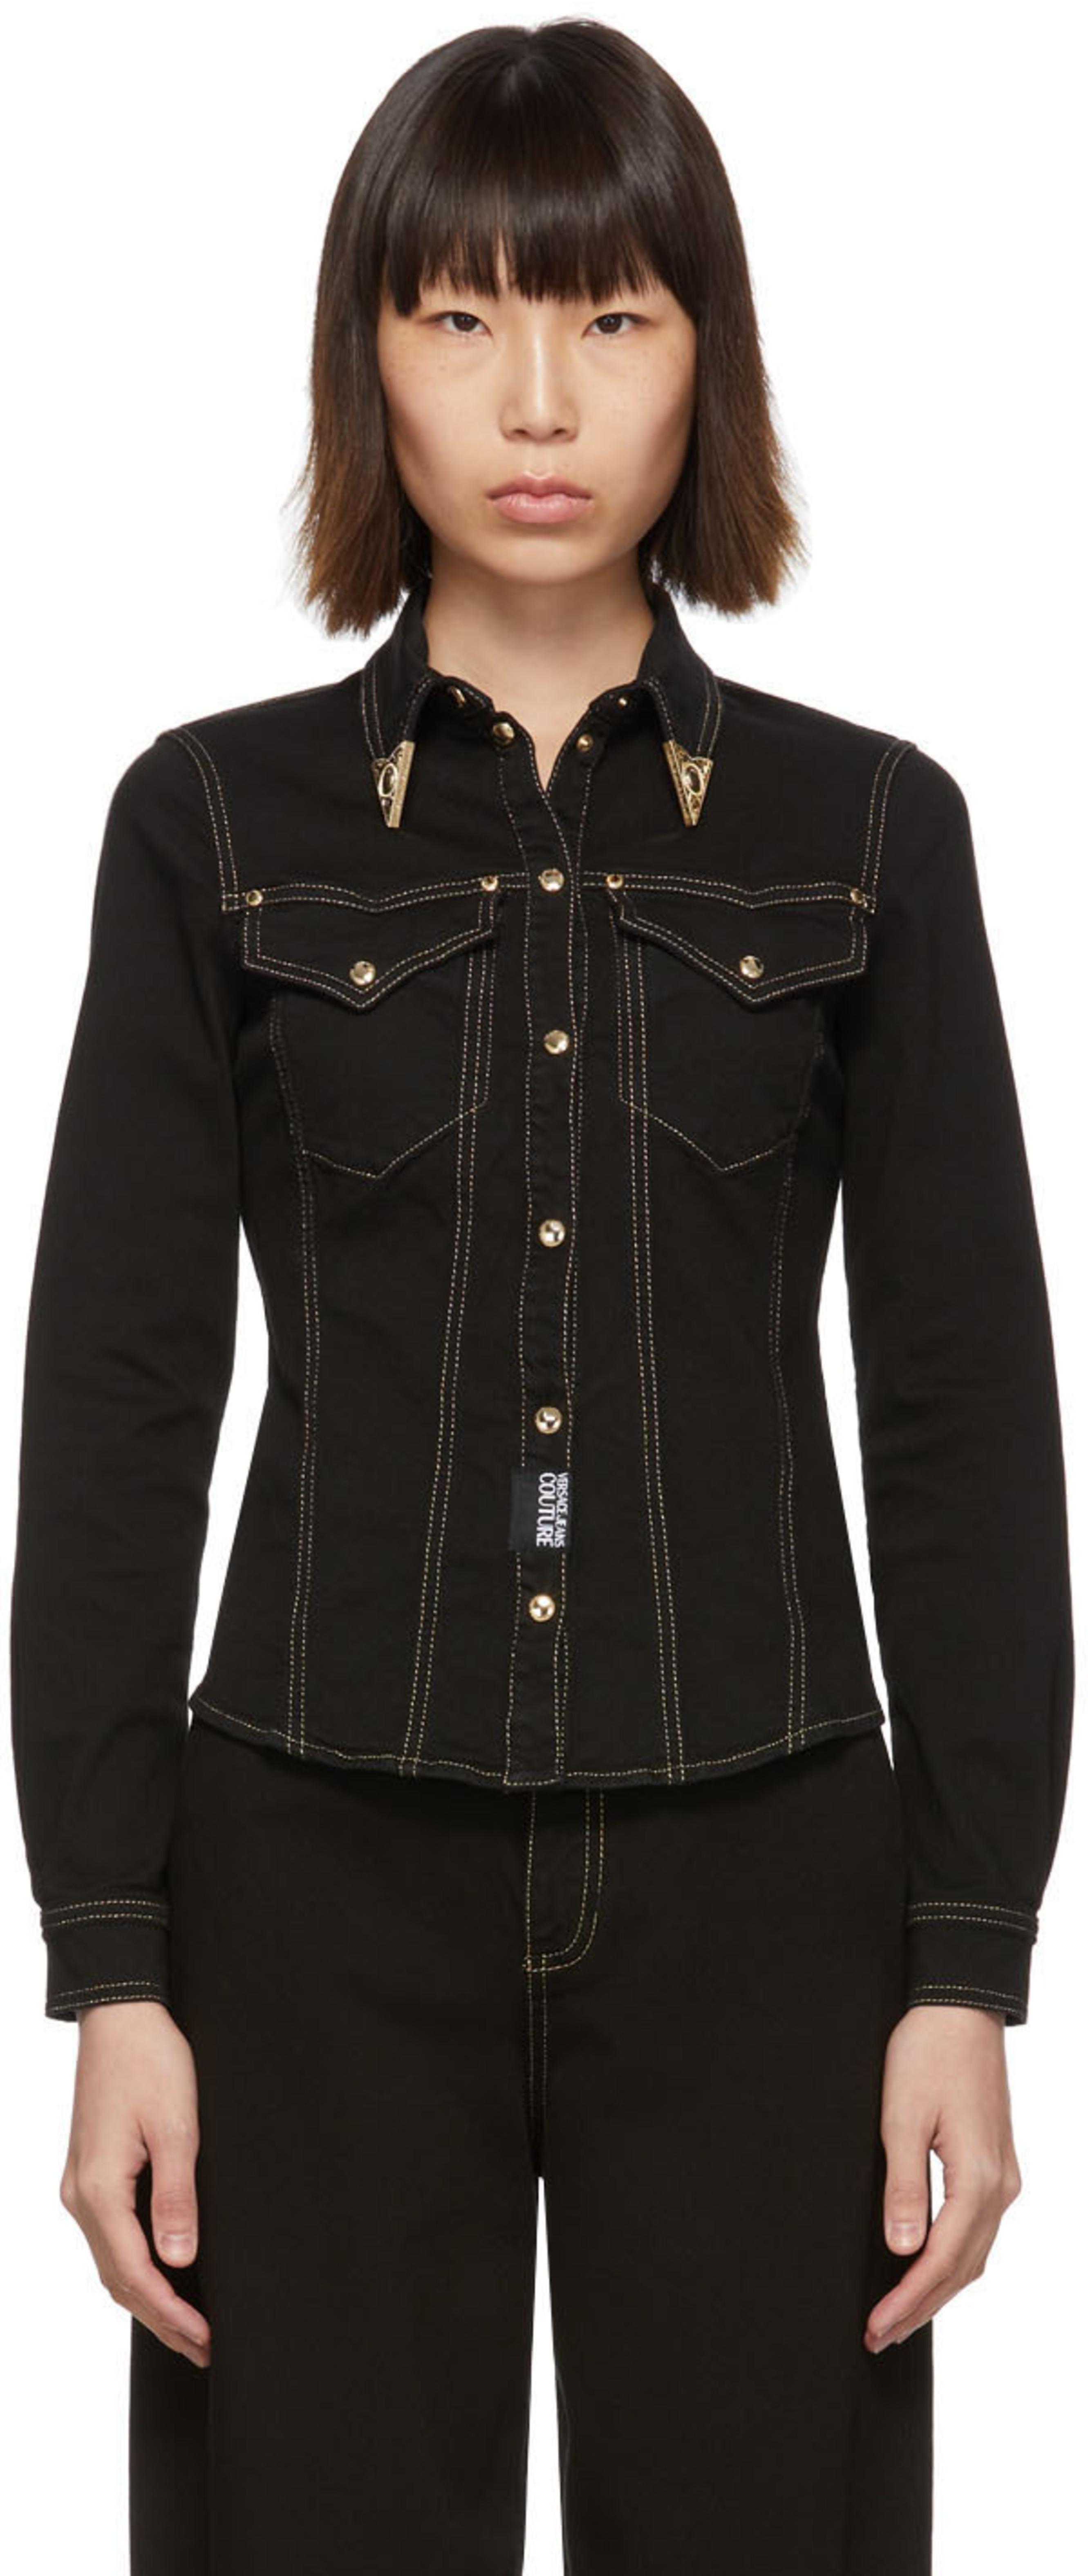 379a35cf57 Black Denim Fitted Shirt